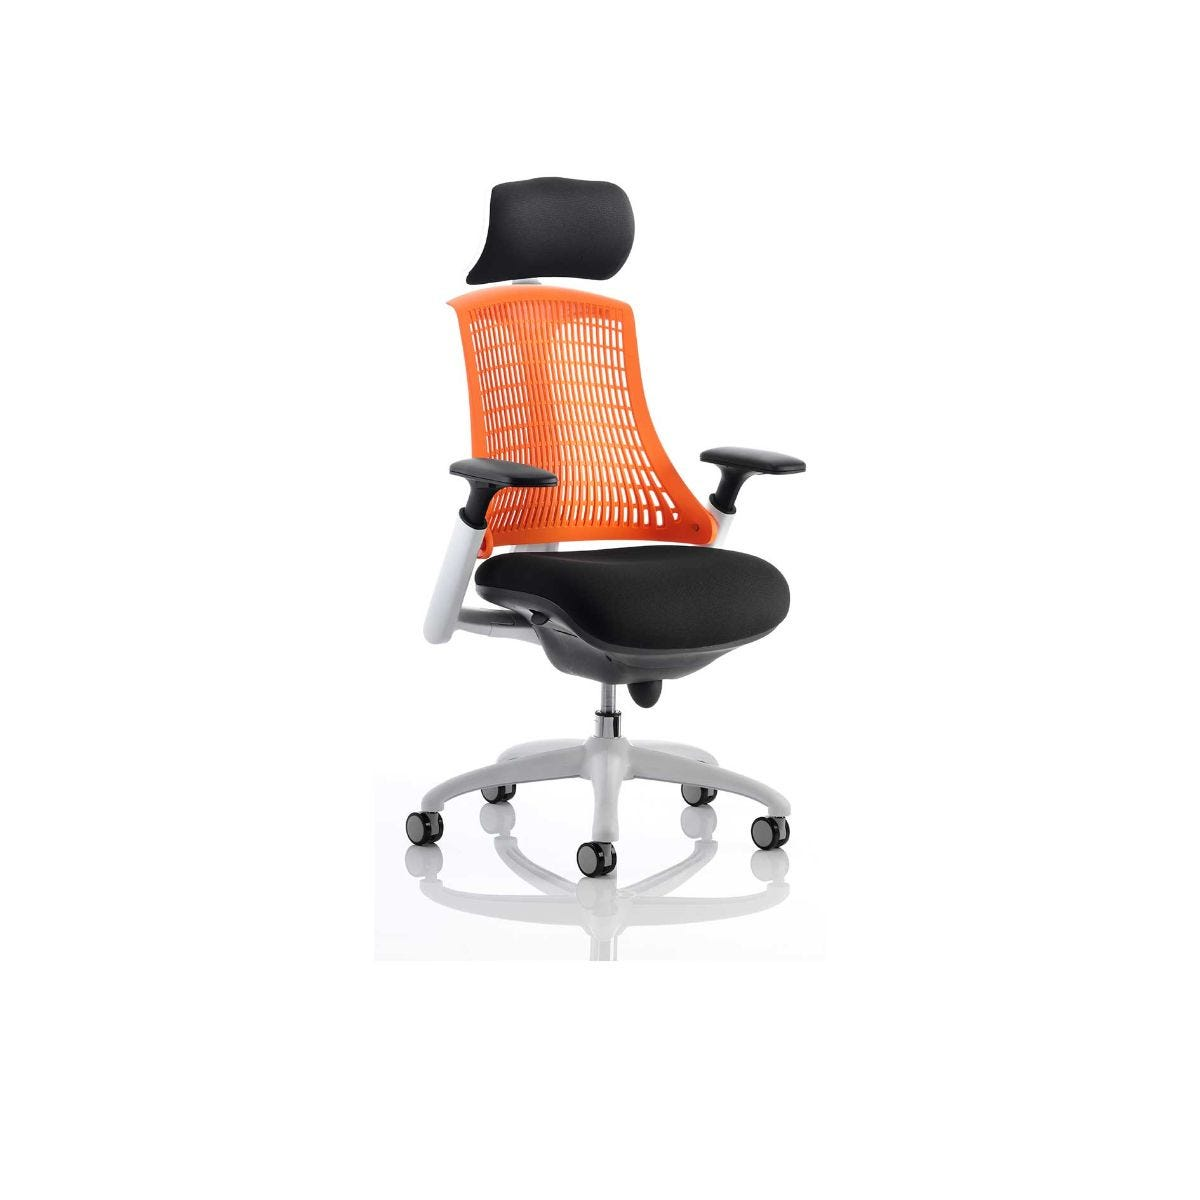 Flex Task Office Chair White Frame With Headrest, Orange